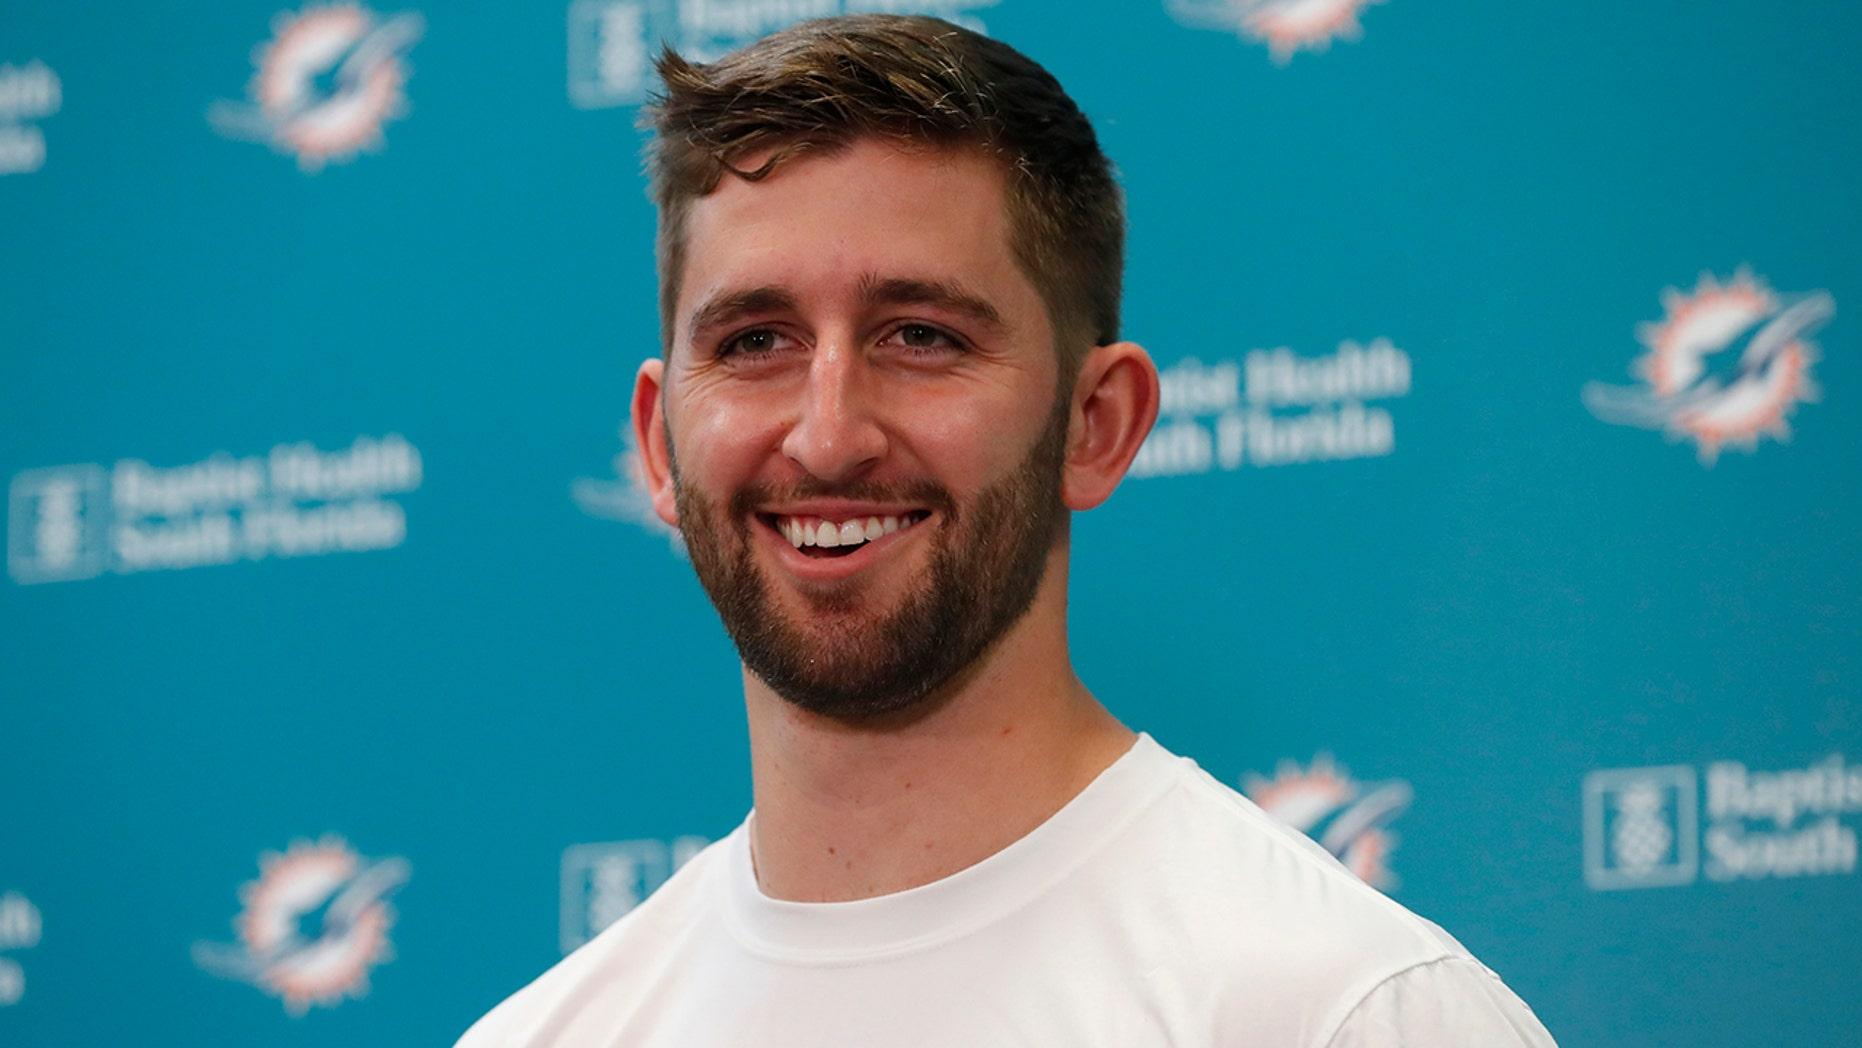 online dating جاش رزن، بازیکن فوتبال NFL میامی که در یک کنفرانس خبری، دوشنبه، 29 آوریل 2019 در تسهیلات آموزش و پرورش دلفین ها در Davie، Fla، سخن می گوید. دلفین ها یک پیش نویس انتخاب دوم 2019 و انتخاب پنجم دورۀ 2020 به آریزونا برای روزن. (AP Photo / Wilfredo Lee)